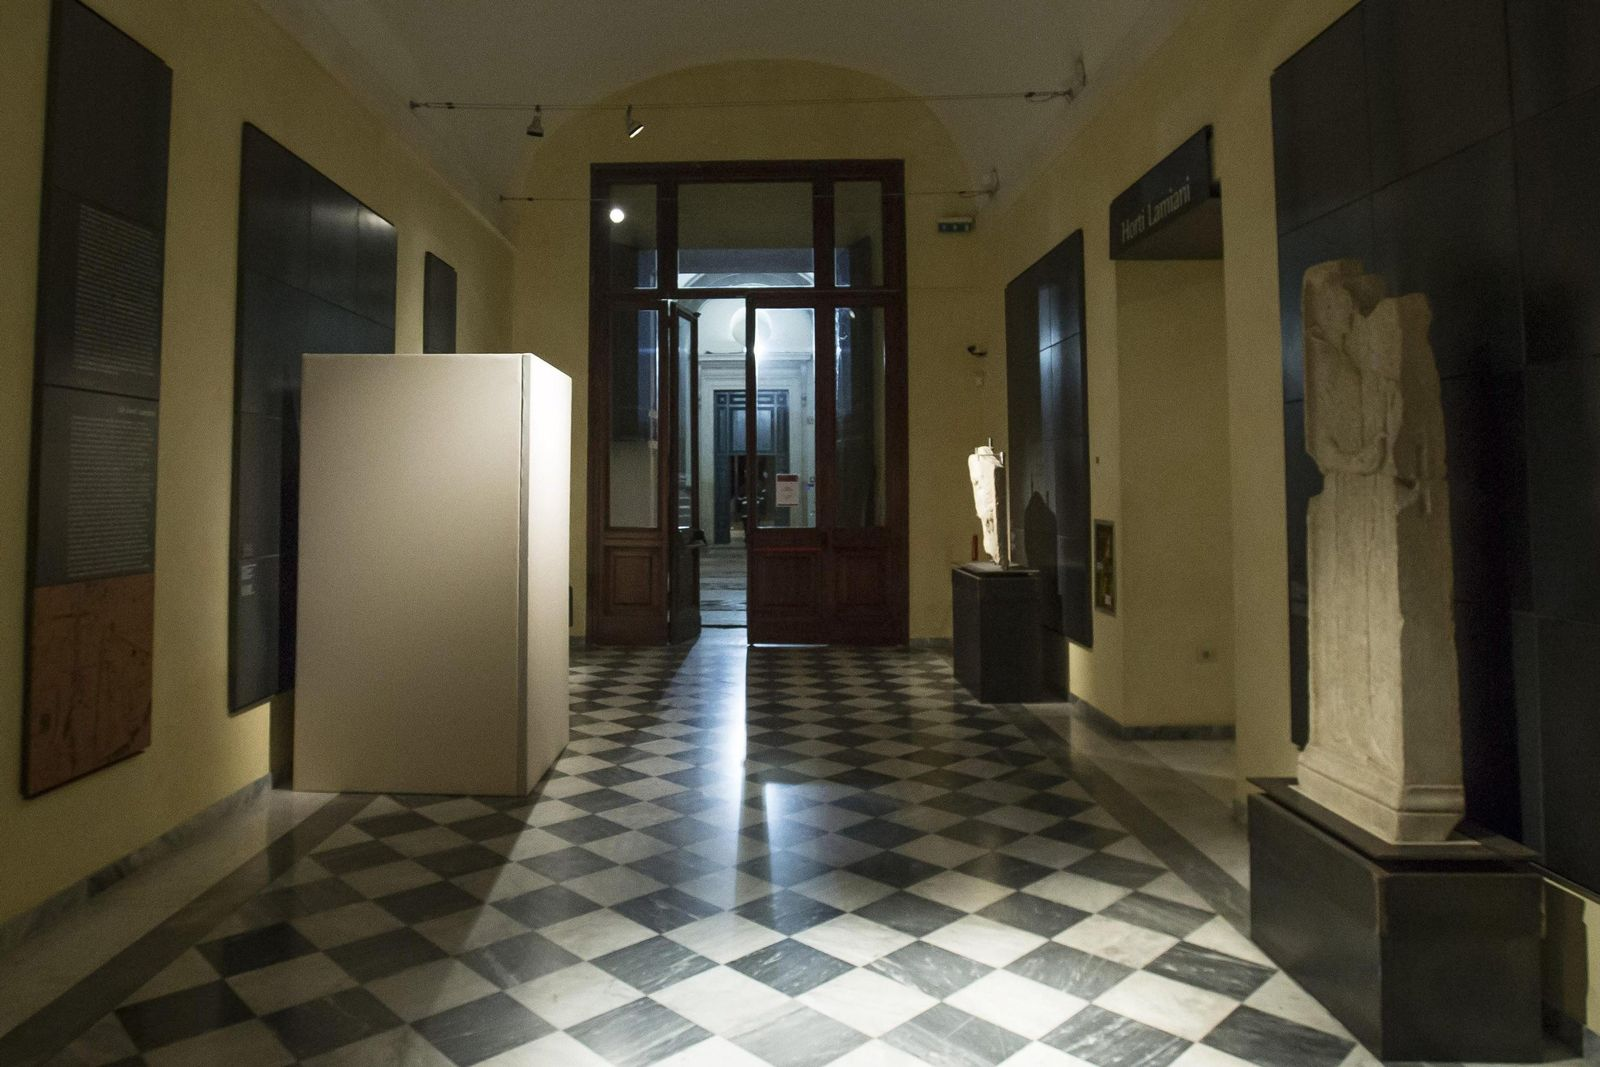 Rom - Nacktstatuen verhüllt